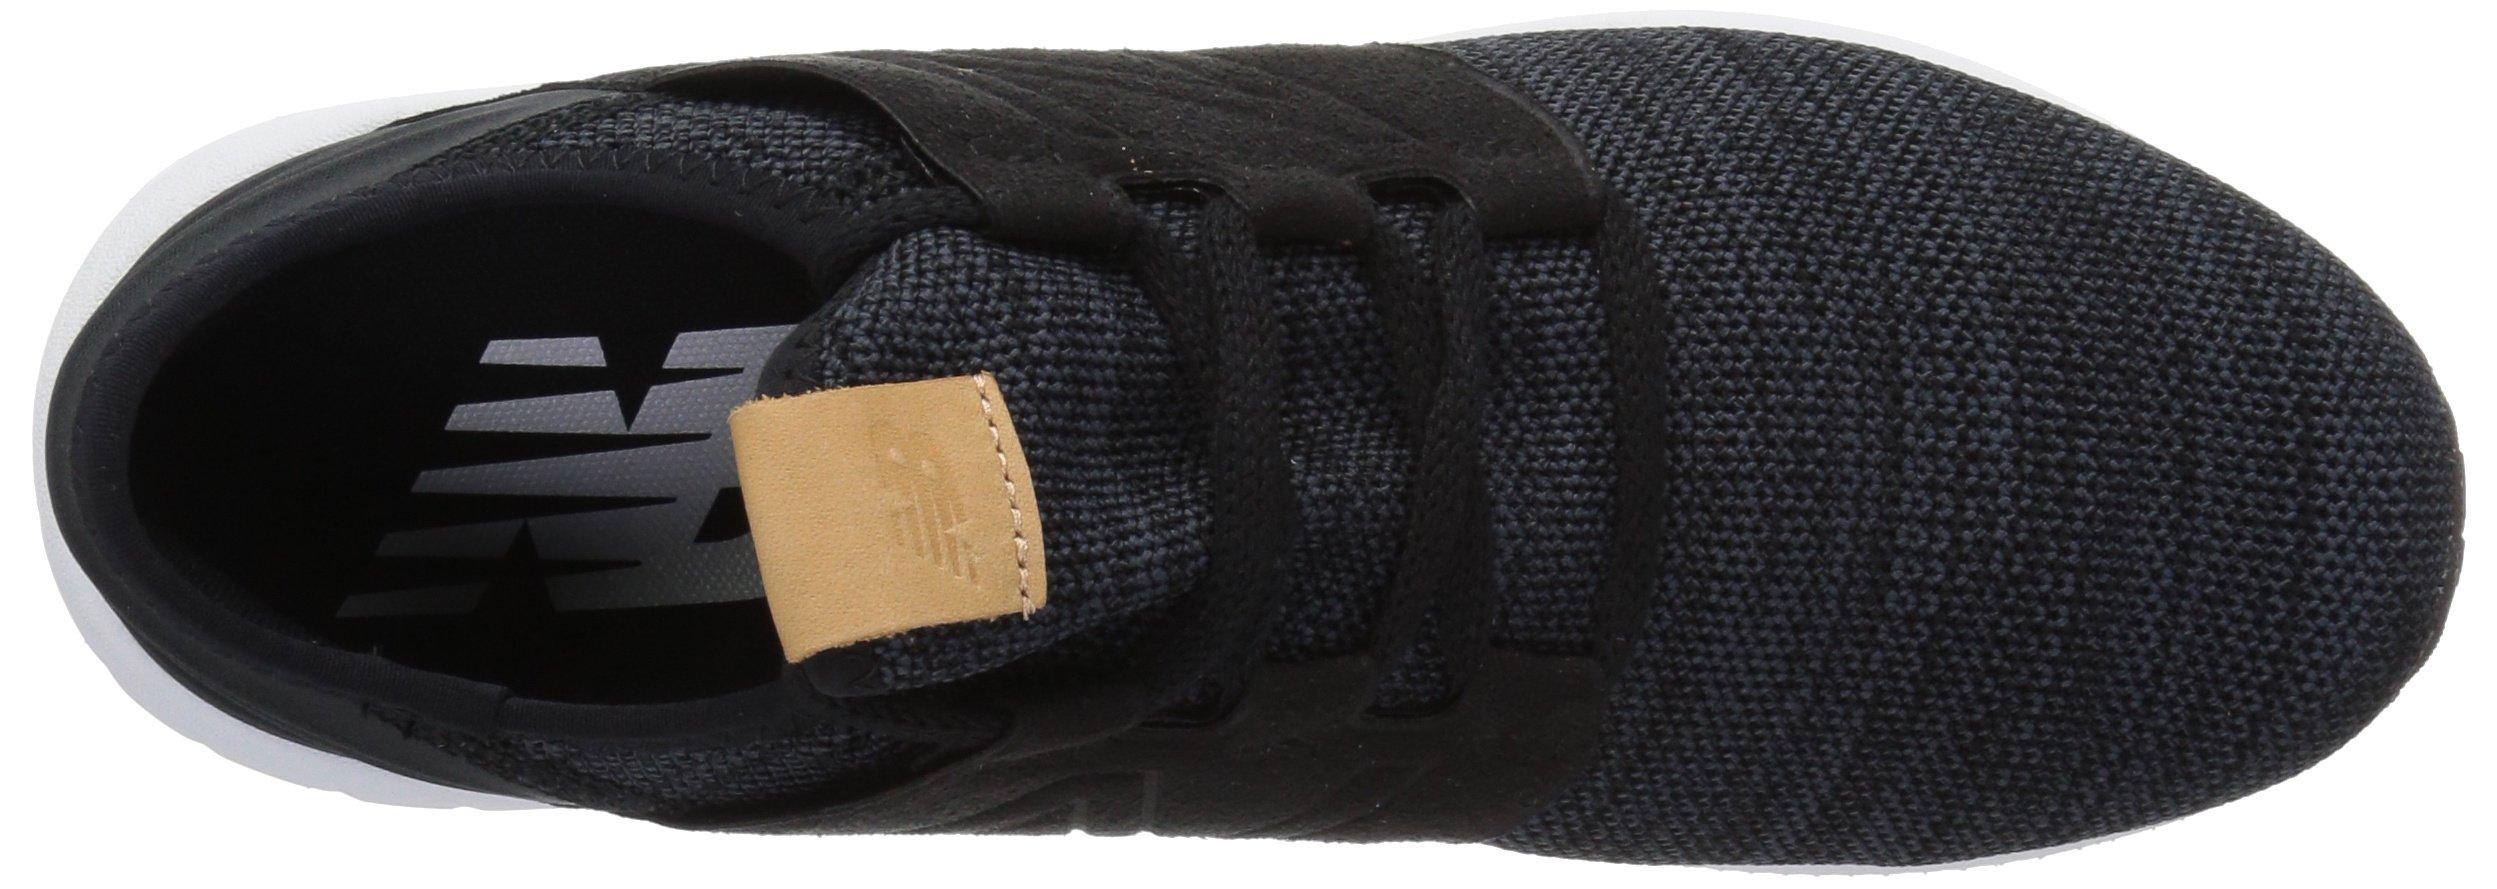 New Balance Men's Cruz V2 Fresh Foam Running Shoe, black/white, 7 D US by New Balance (Image #7)